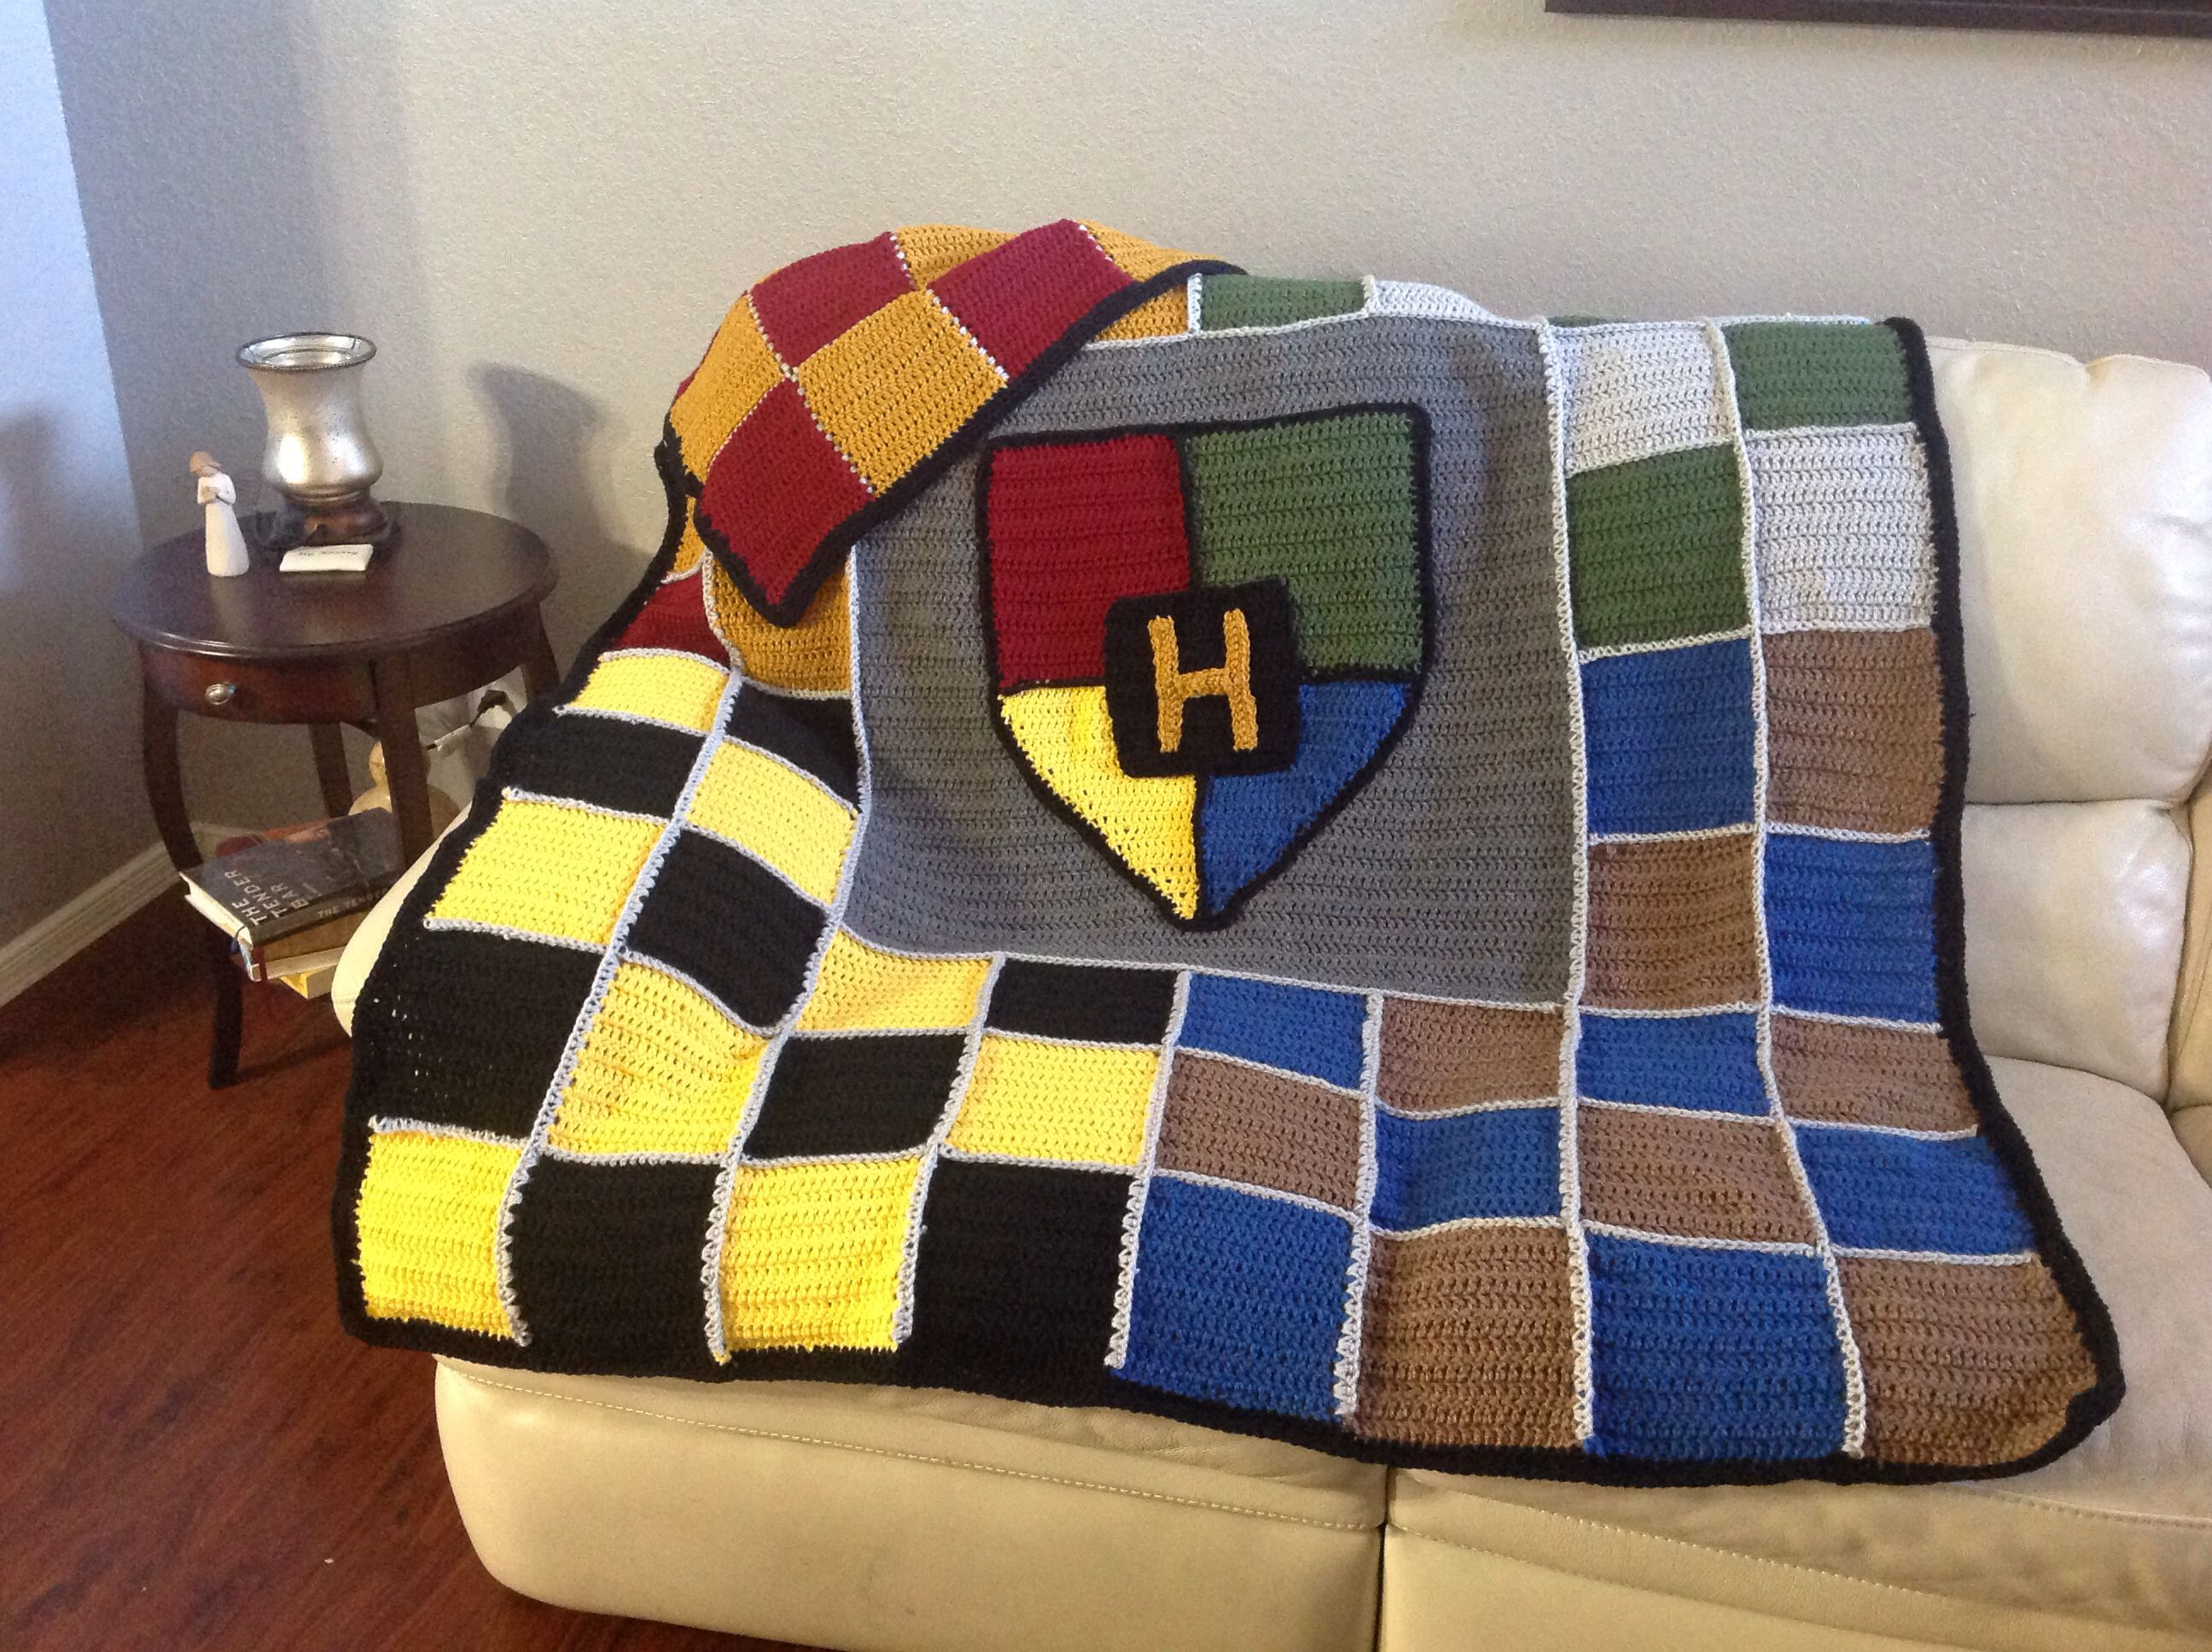 harry potter crochet afghan made for my daughter august 2014 yay h keln crochet. Black Bedroom Furniture Sets. Home Design Ideas